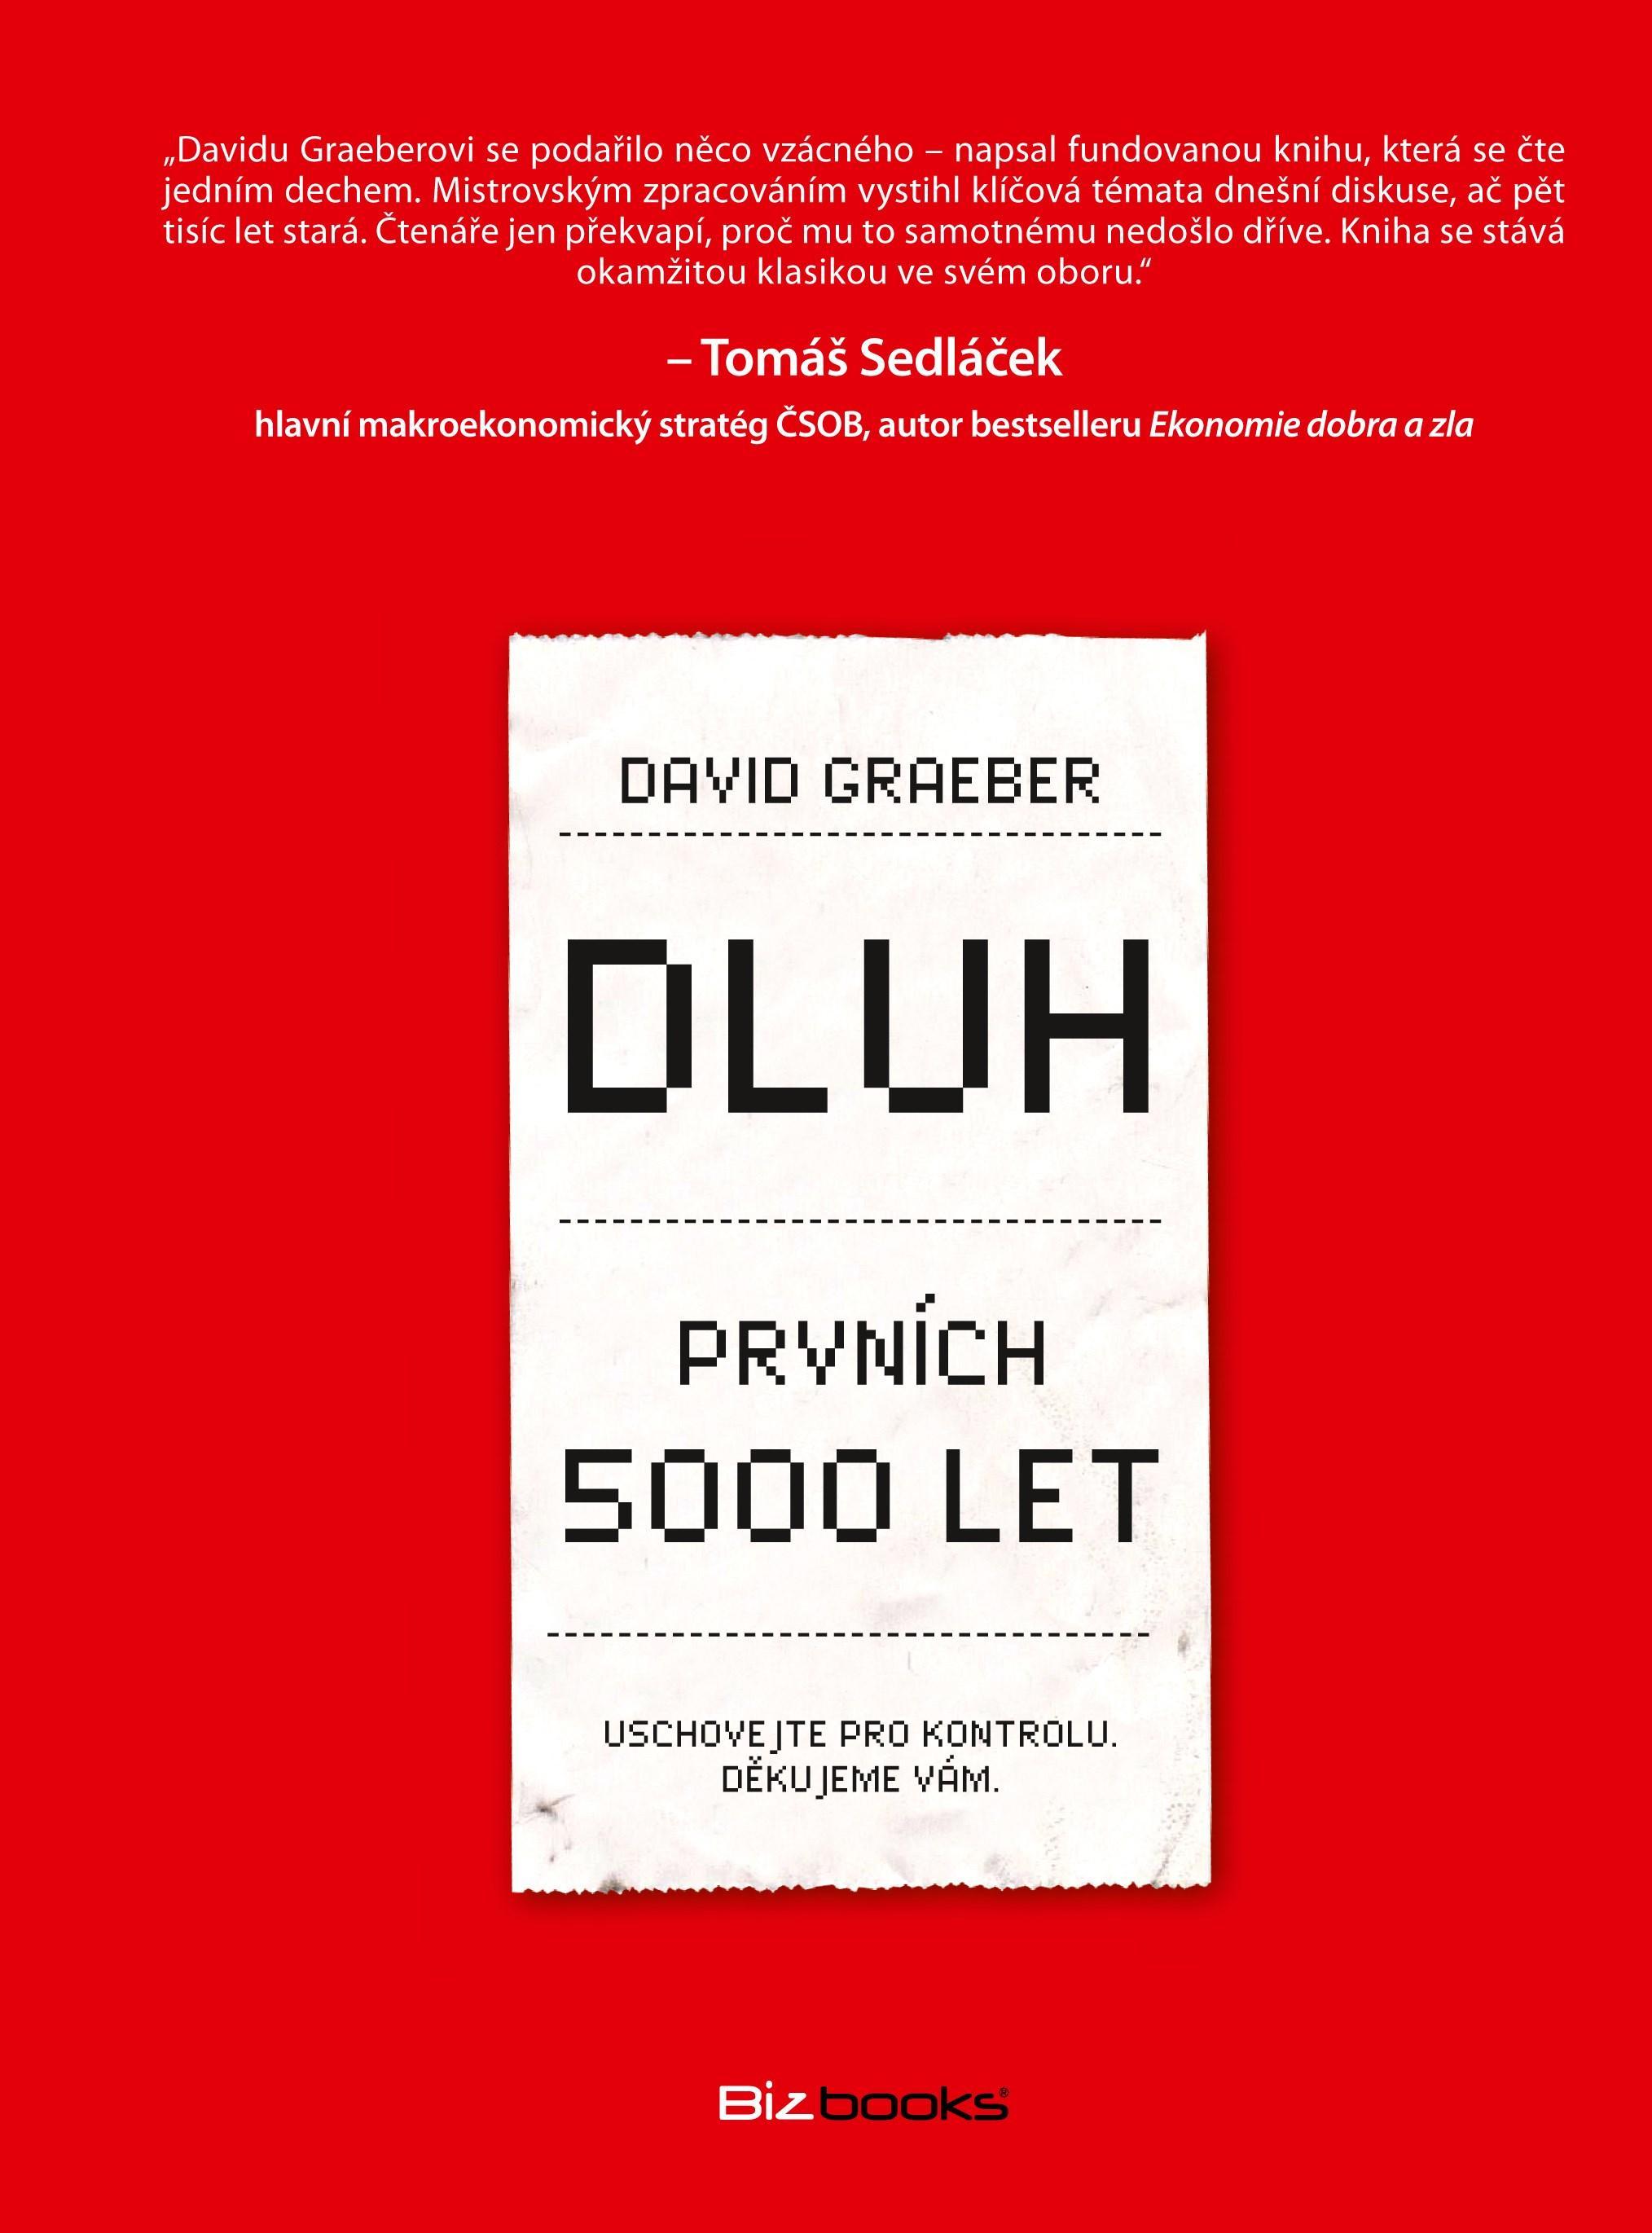 David Graeber: Dluh